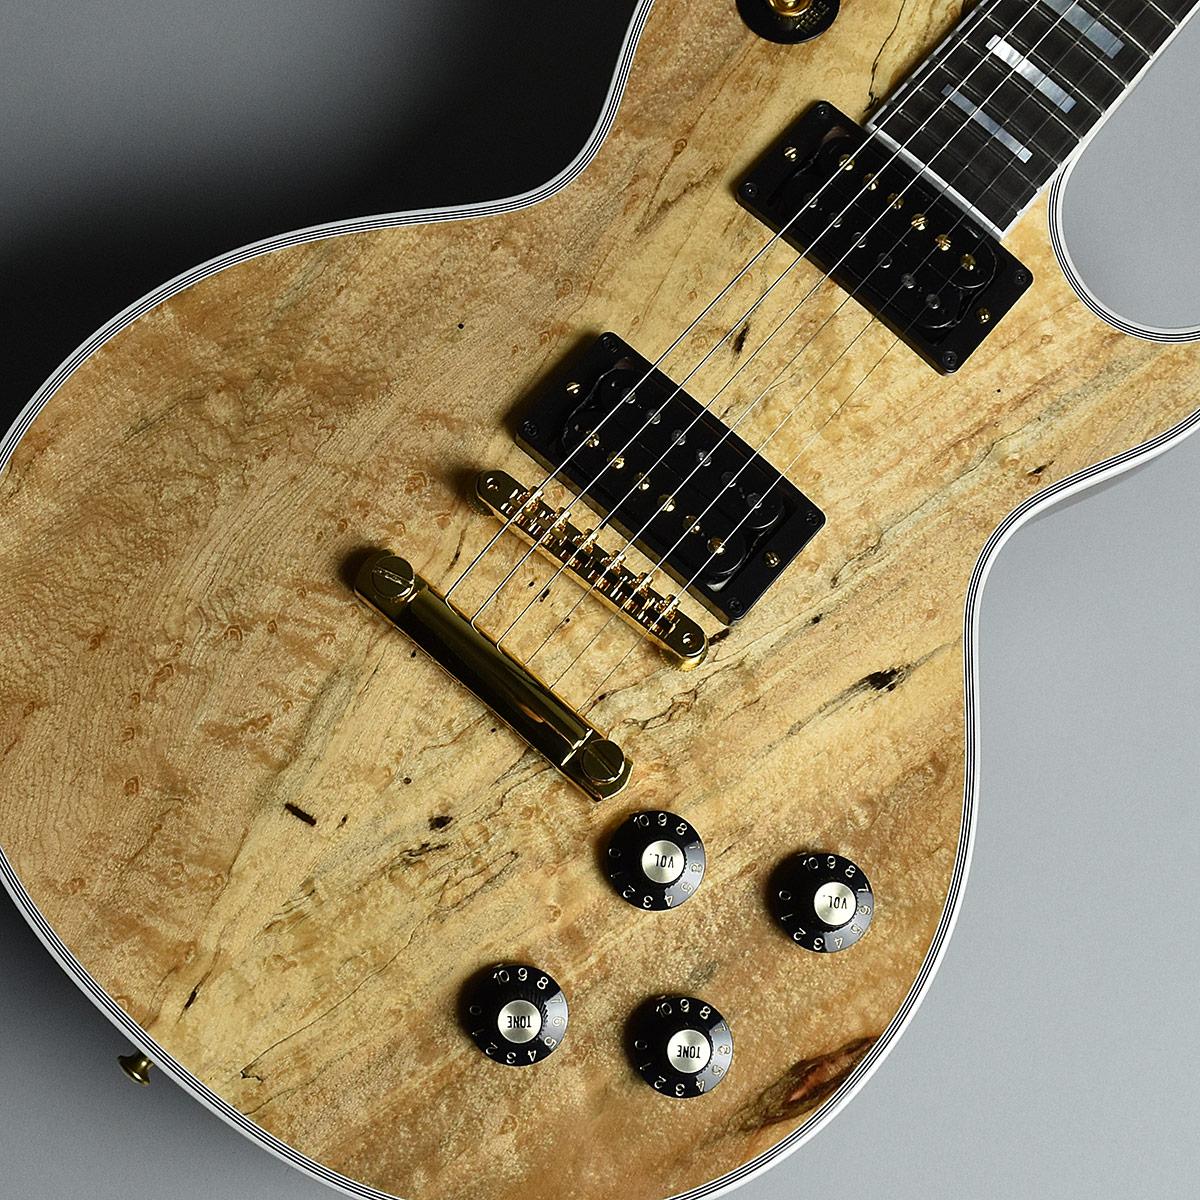 Gibson Custom Shop 1968 Les Paul Custom Burl Maple Natural S/N:080048 現地選定材オーダー品 【ギブソン カスタムショップ】【未展示品】